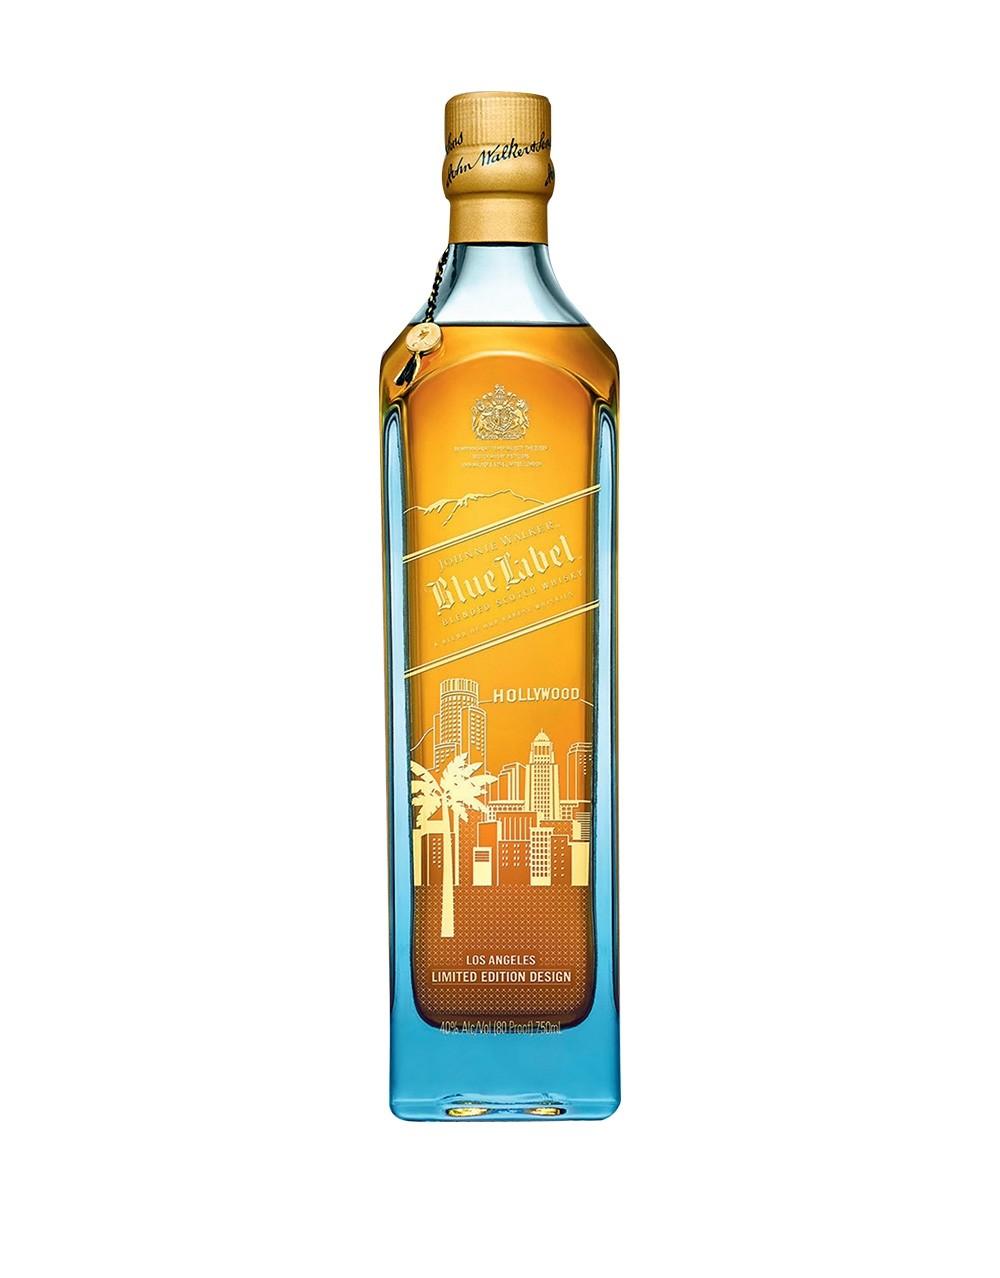 Johnnie Walker - Scotch | Buy Online or Send as a Gift | ReserveBar